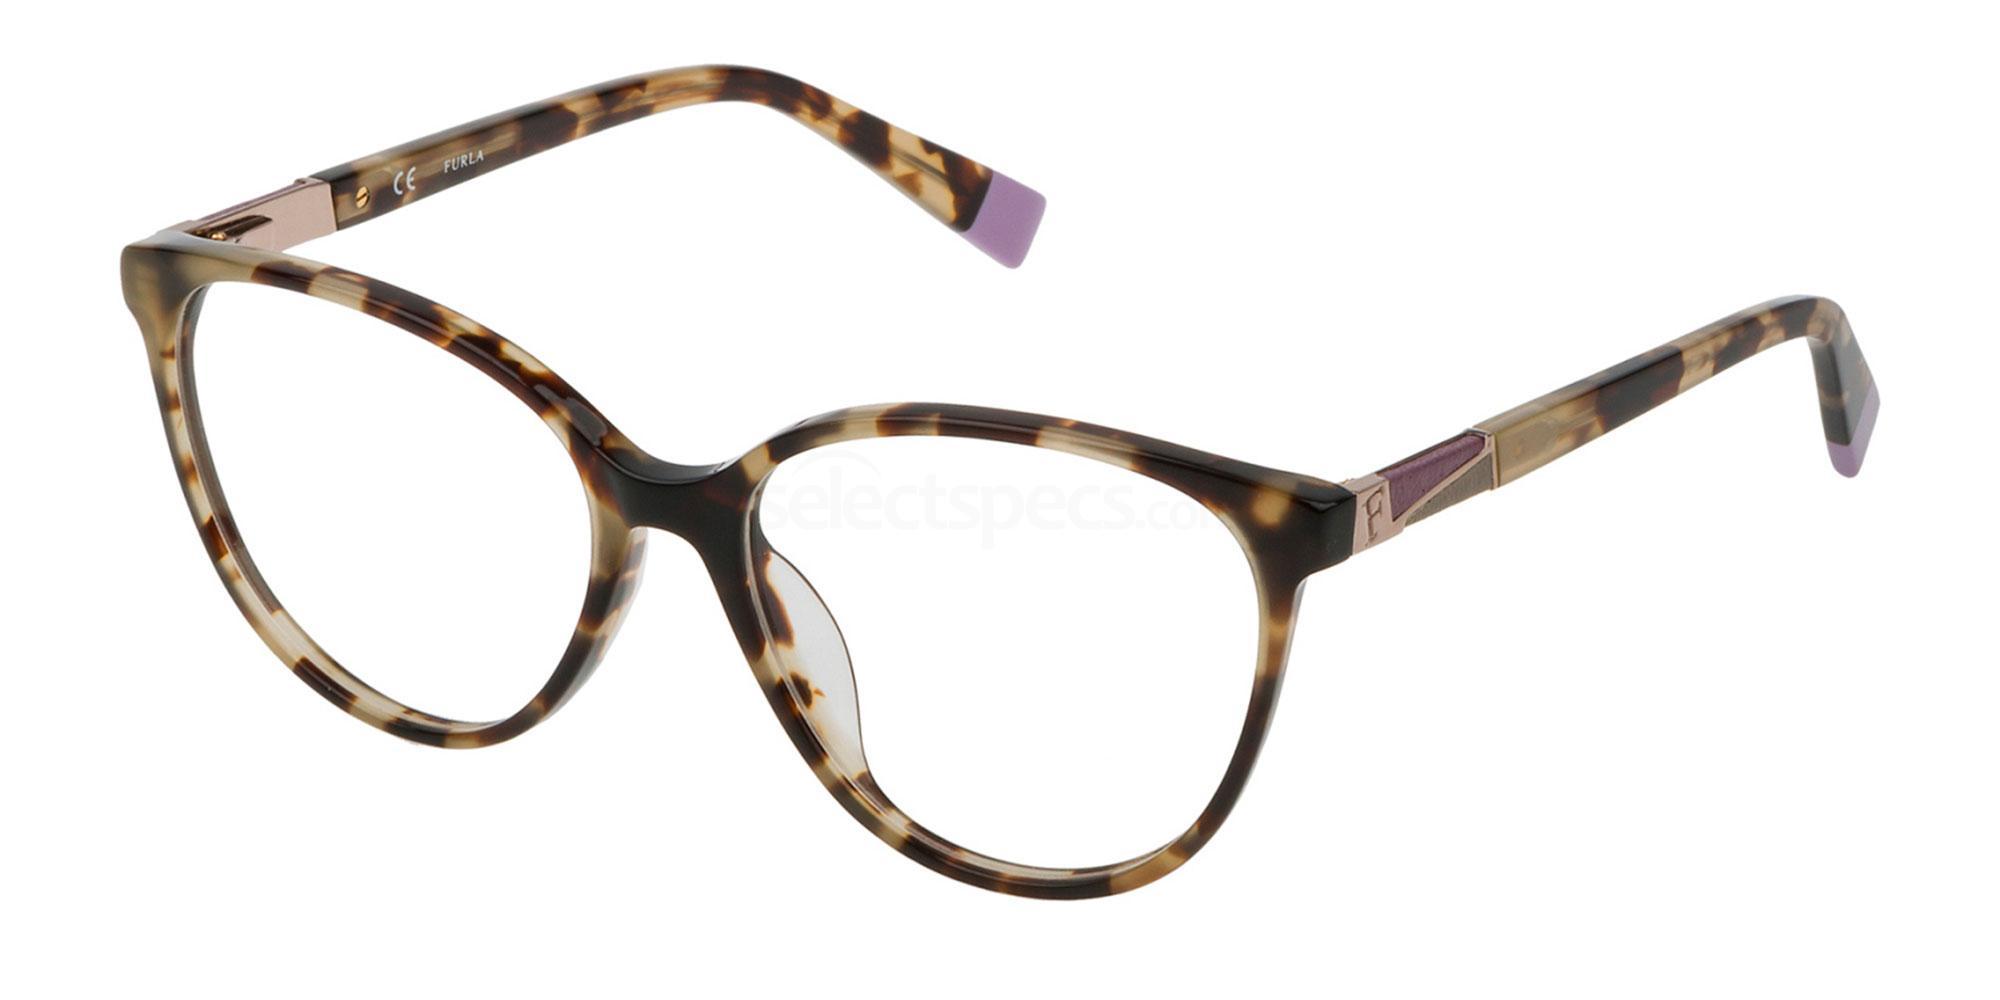 06ZE VFU189 Glasses, Furla